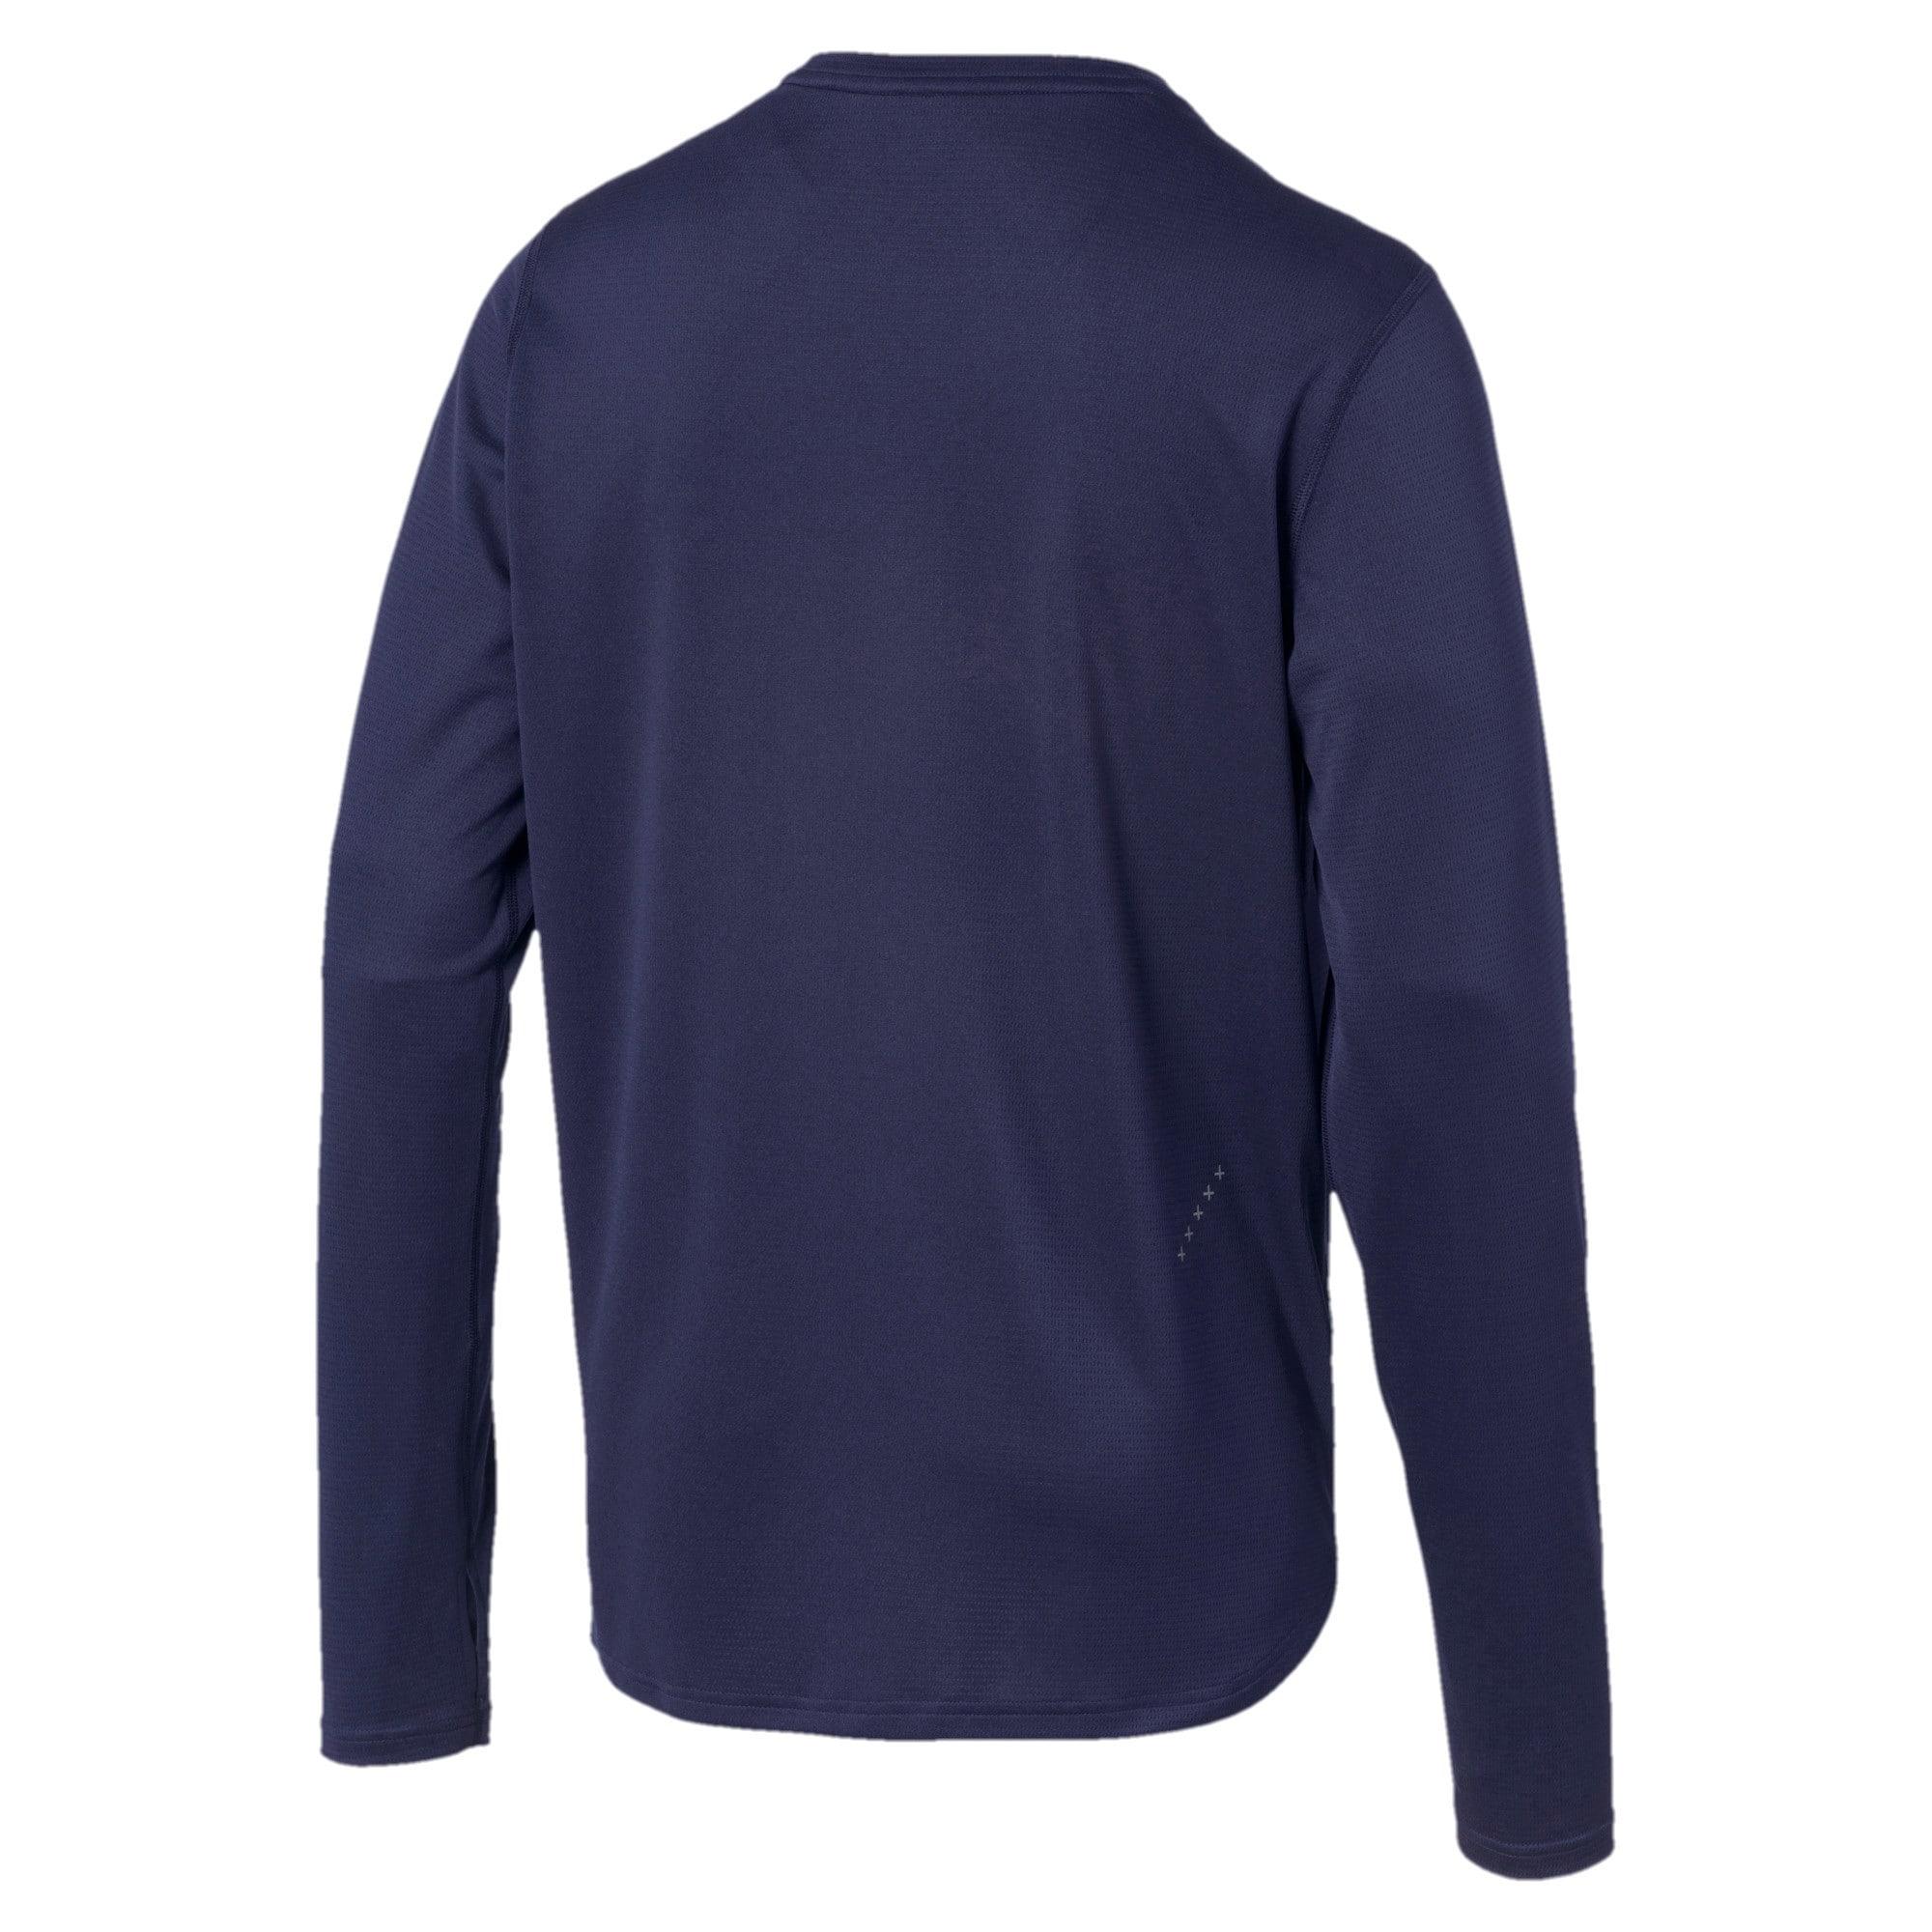 Thumbnail 5 of Ignite Men's Long Sleeve Tee, Peacoat-Blue Turquoise, medium